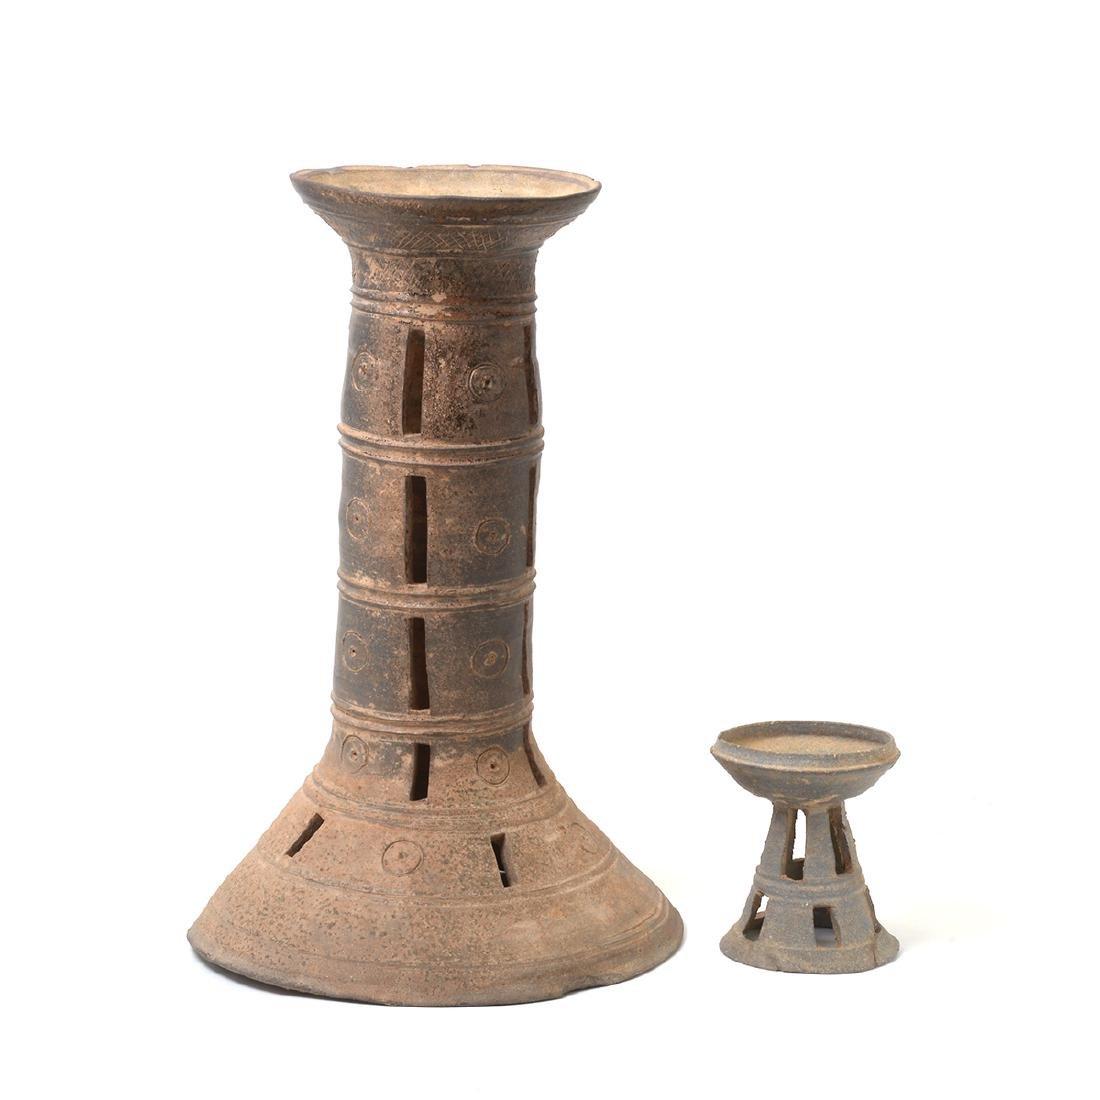 Two Korean Ceramic Stands, Silia Dynasty